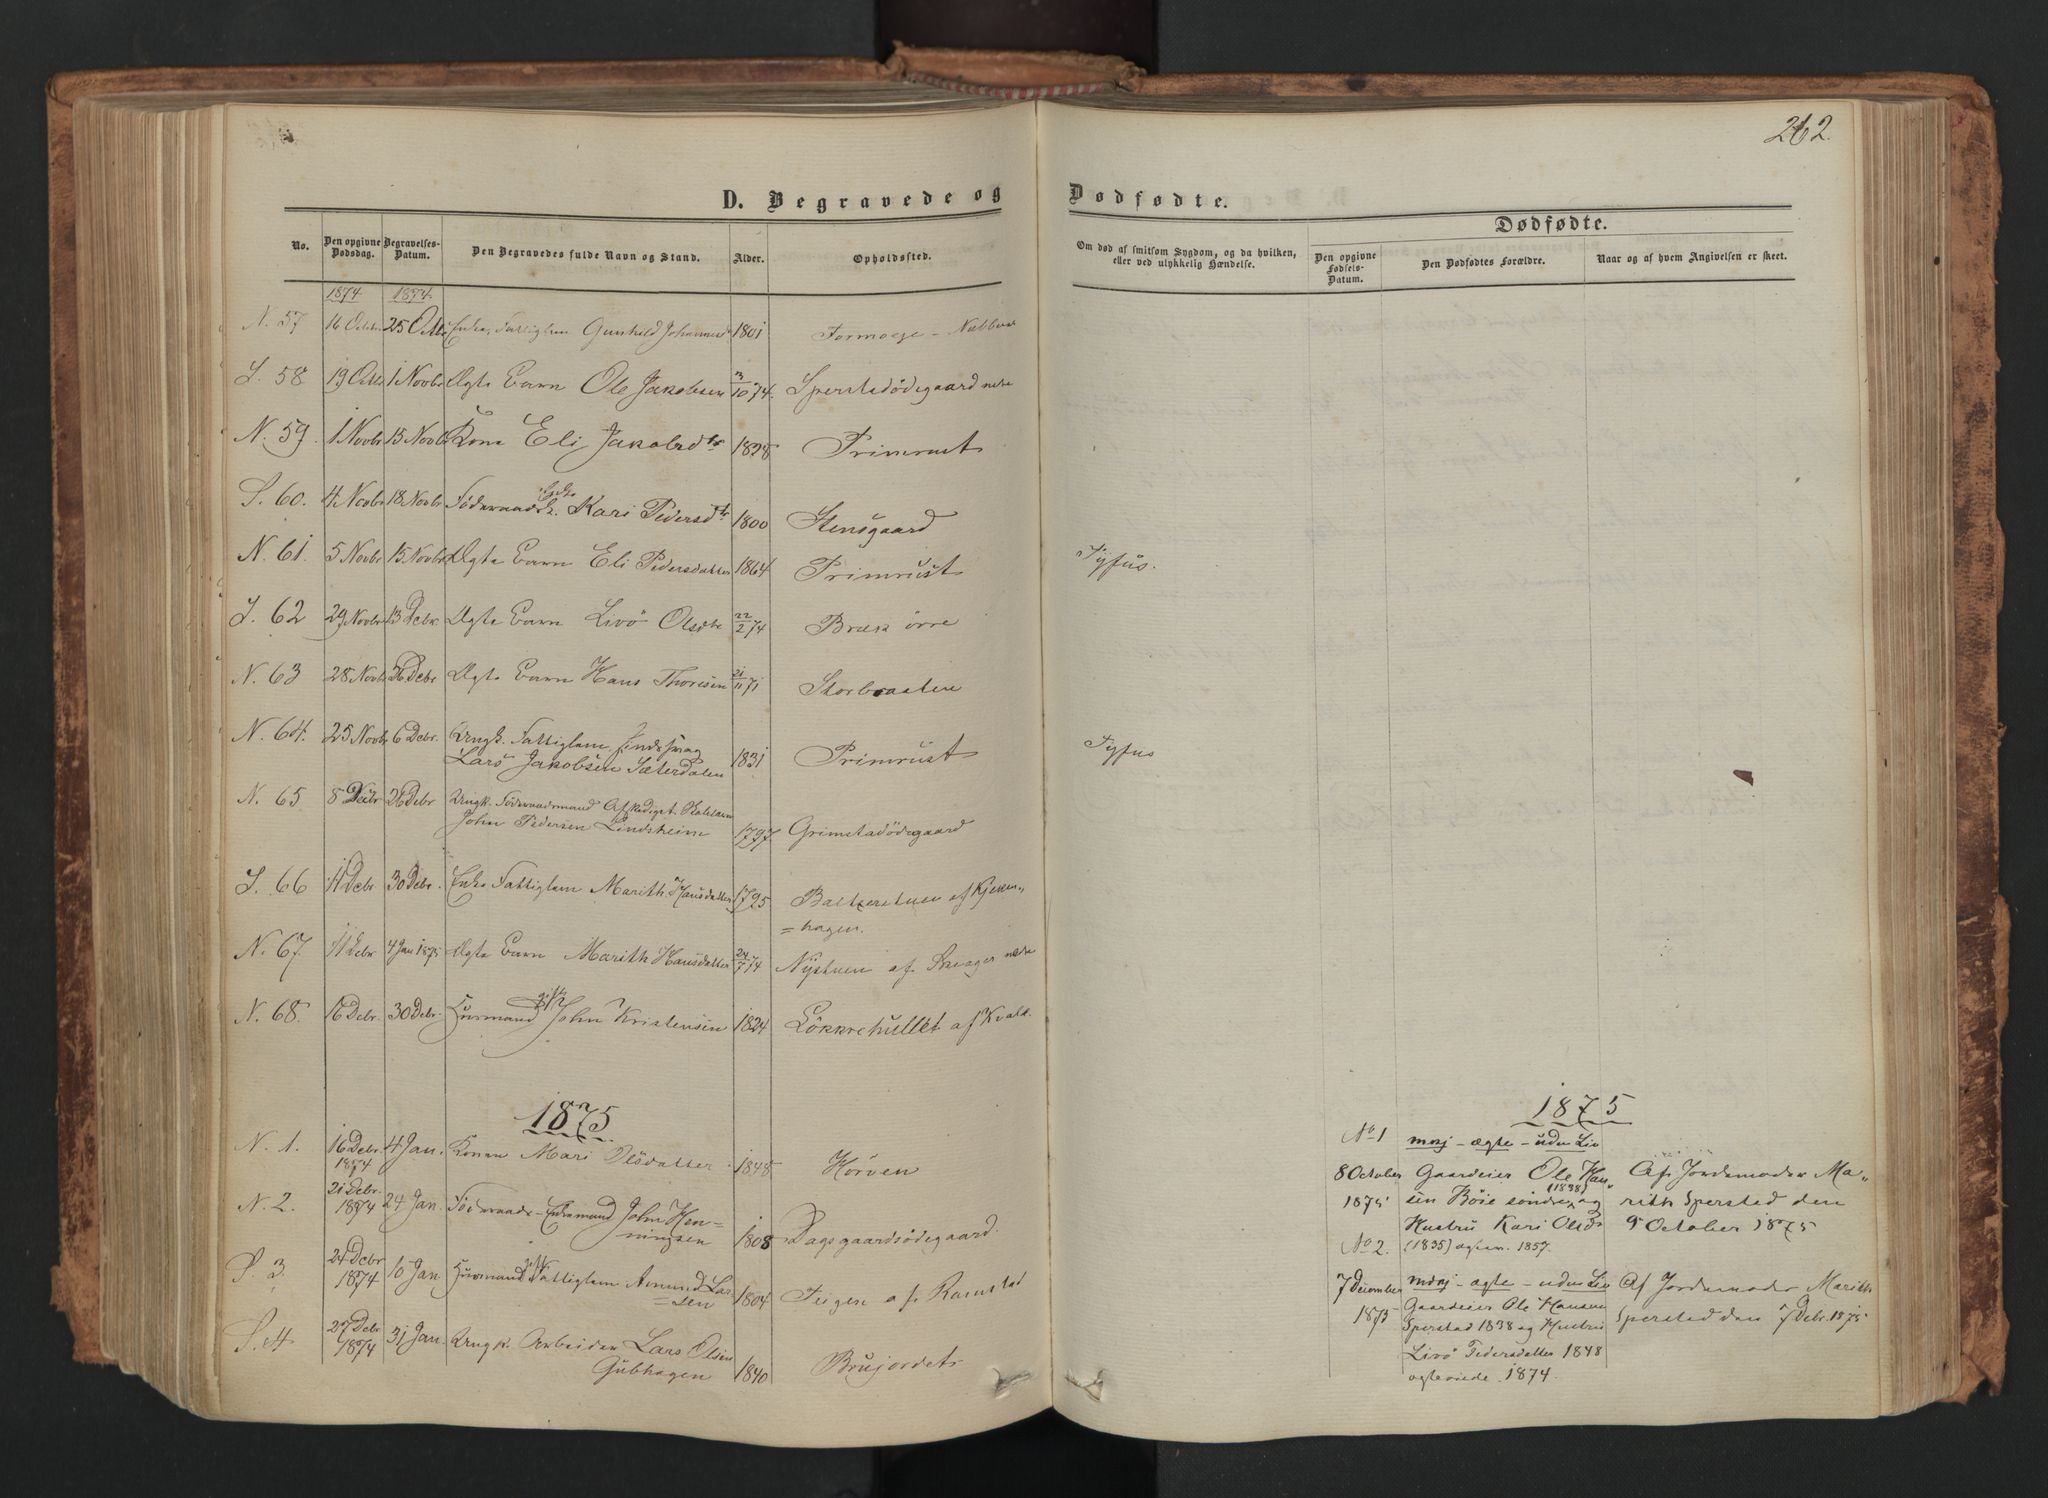 SAH, Skjåk prestekontor, Ministerialbok nr. 1, 1863-1879, s. 262